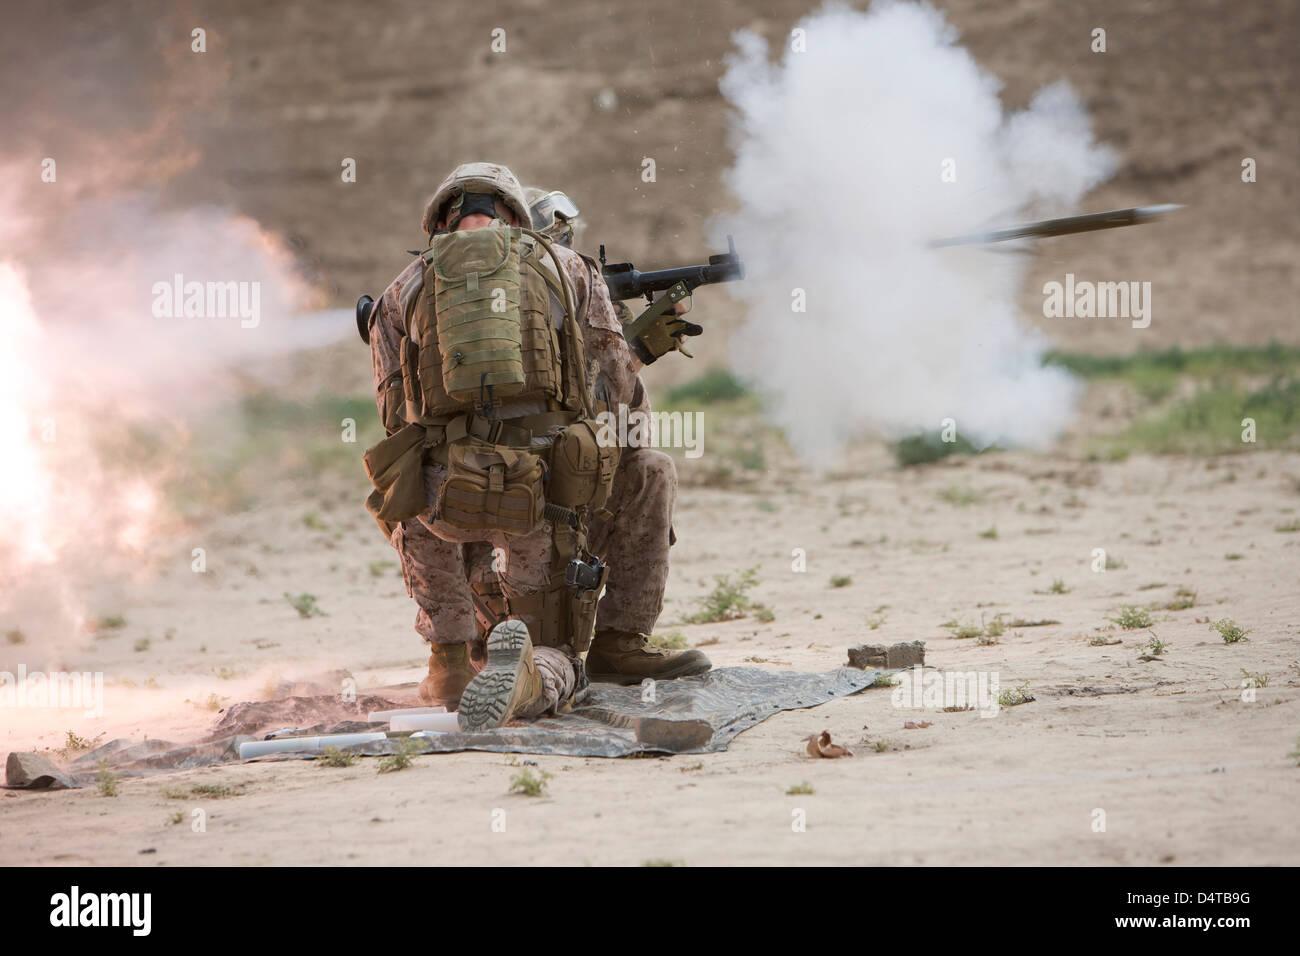 U.S. Marine fires a rocket-propelled grenade launcher. - Stock Image